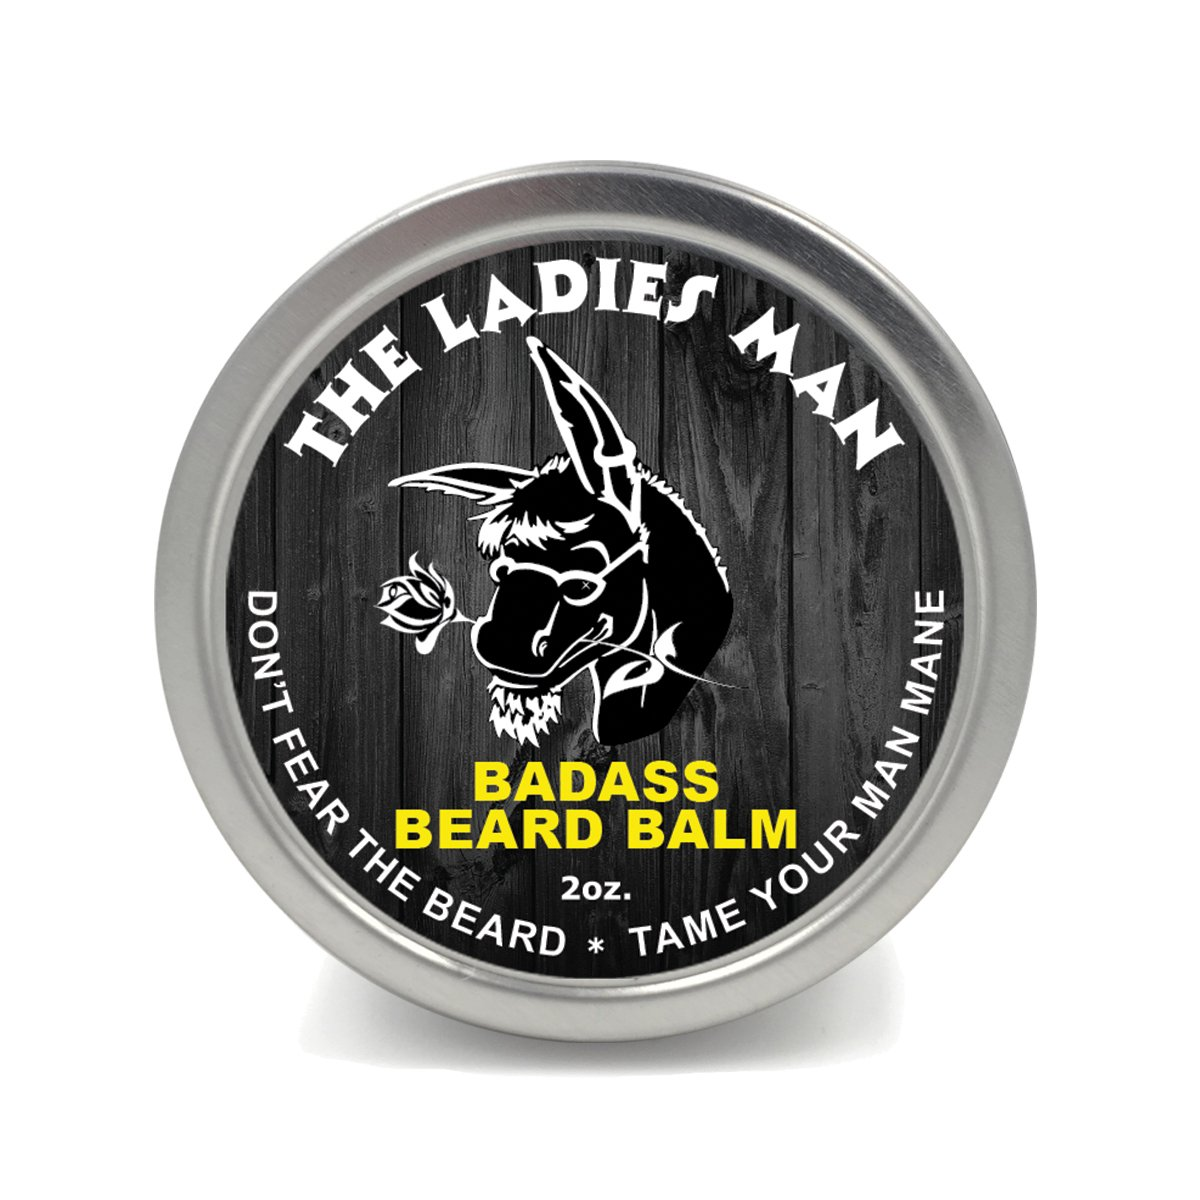 Badass Beard Care Beard Balm The Ladies Man Scent